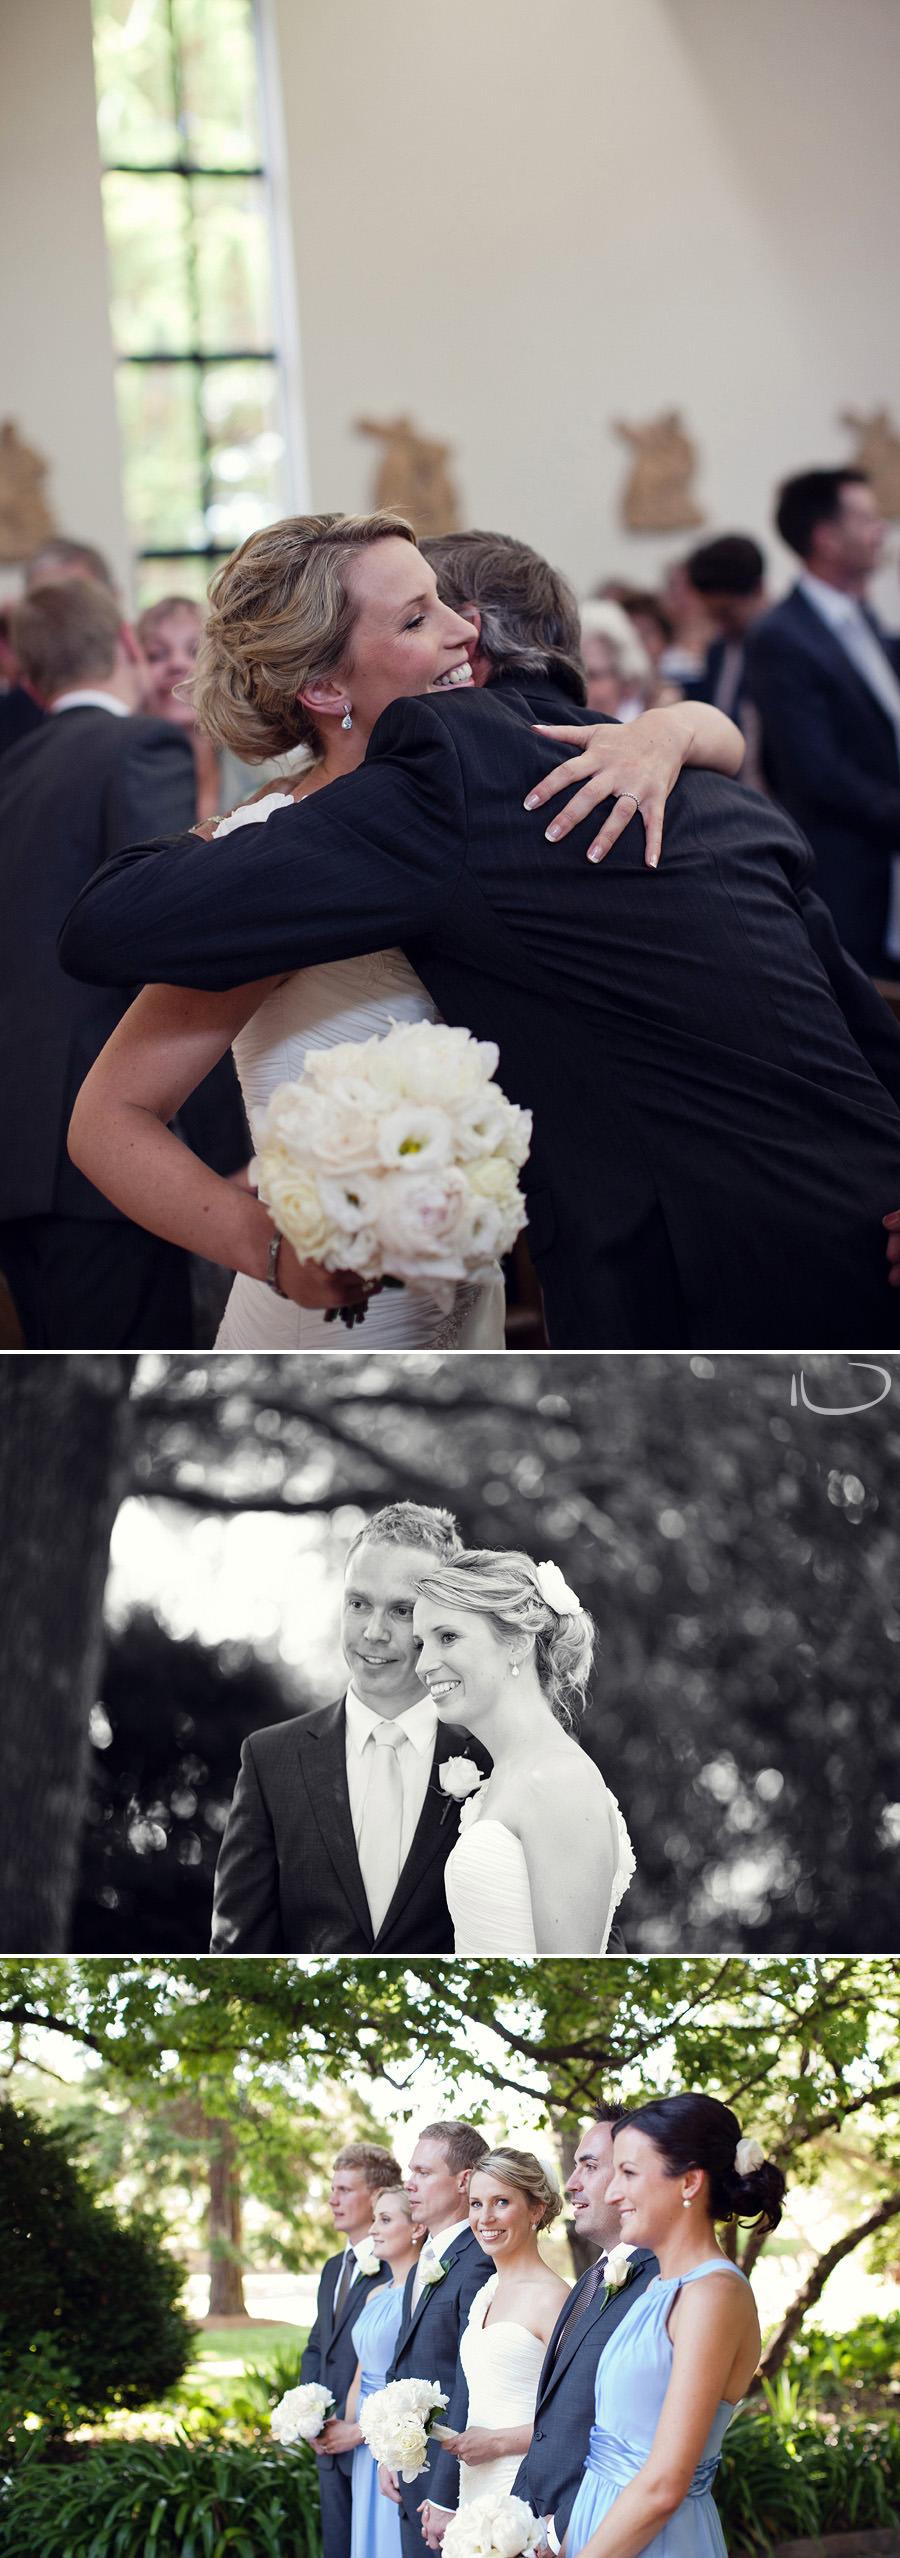 Duntroon Chapel Wedding Photographer: Bride & Groom portraits